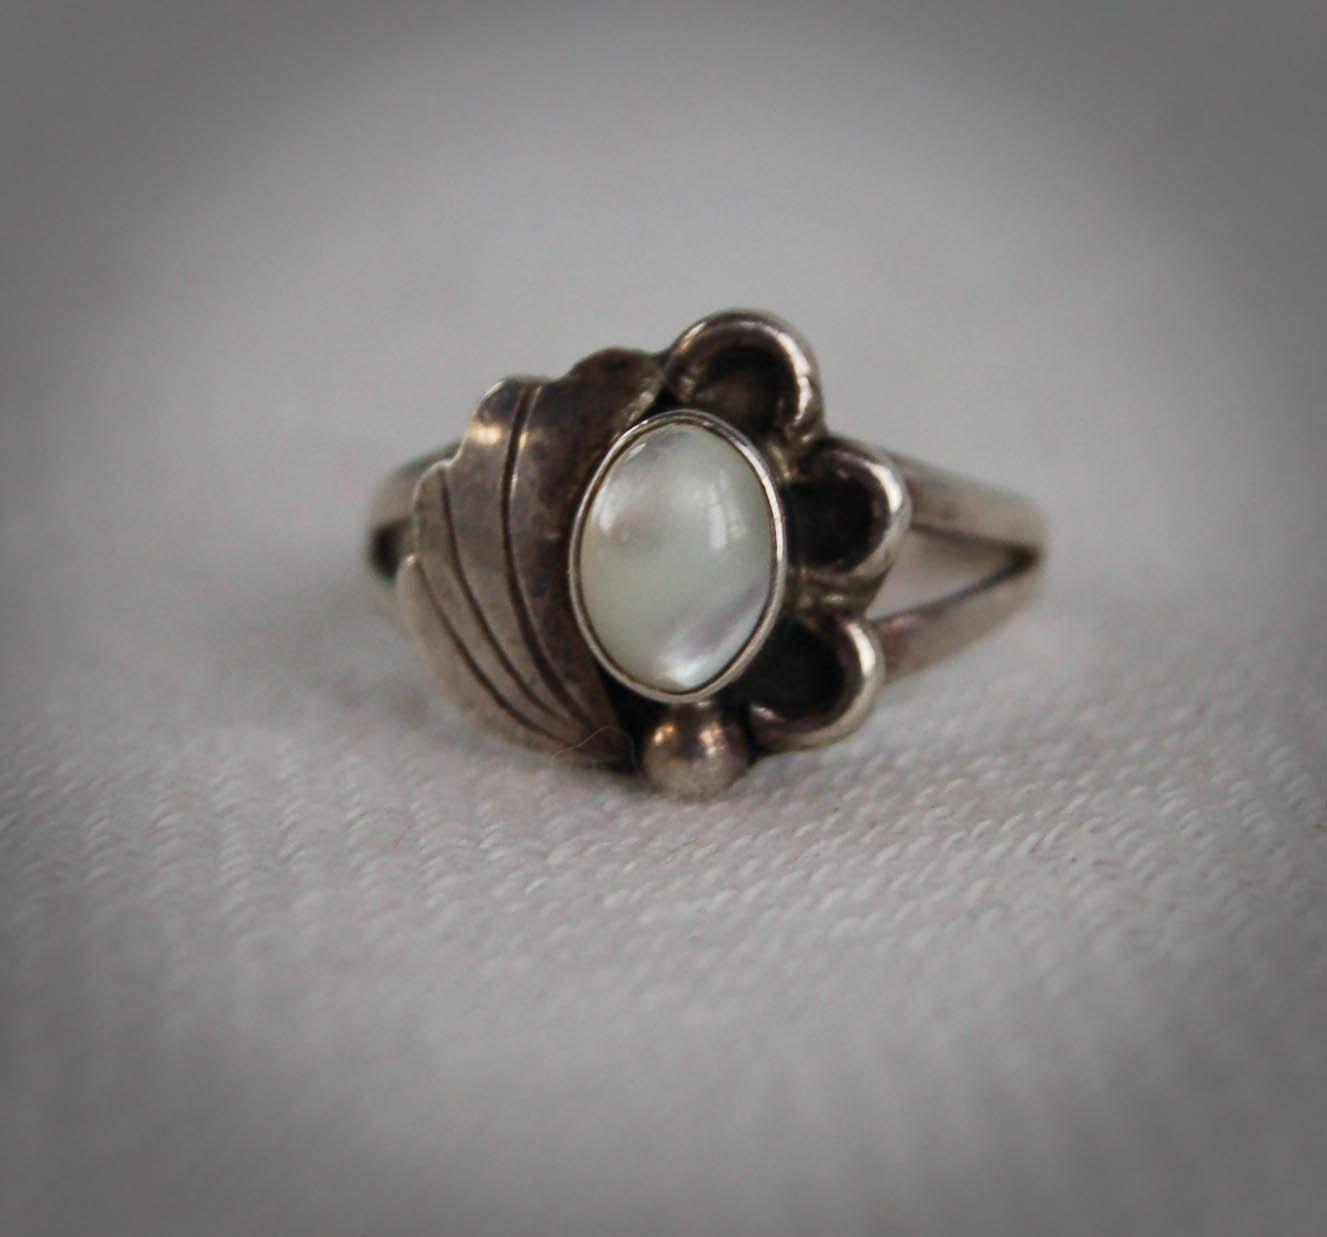 jewelry etsy - HD1327×1237